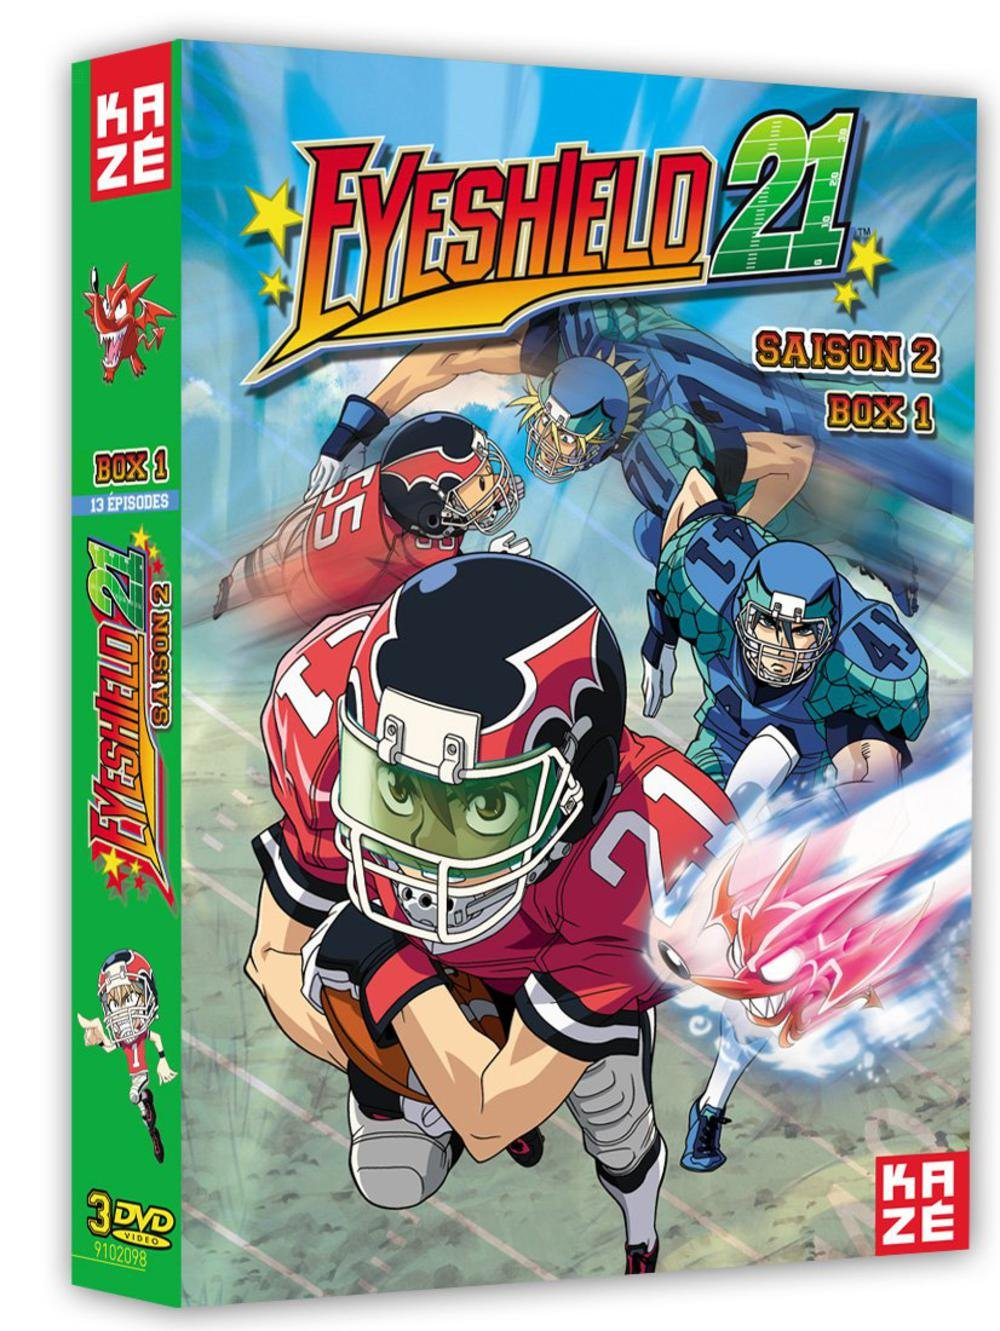 Amazon.com: Eyeshield 21 Vol.1/4 - Saison 2: Movies & TV